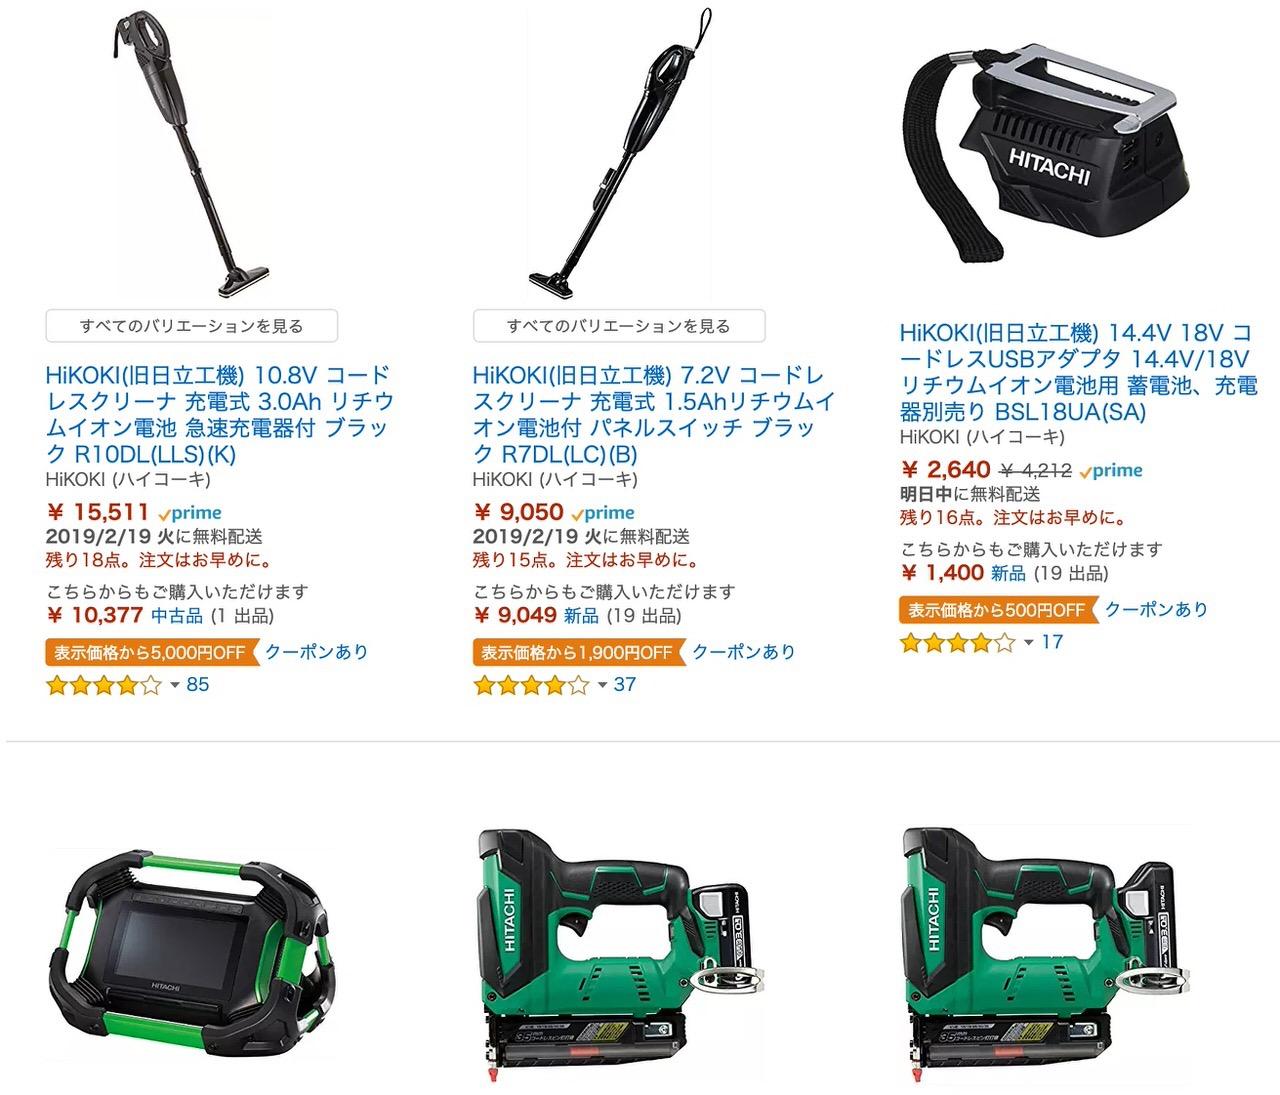 【Amazon】「HiKOKI(ハイコーキ:旧日立工機)」コードレス掃除機や電動工具がクーポンセール実施中